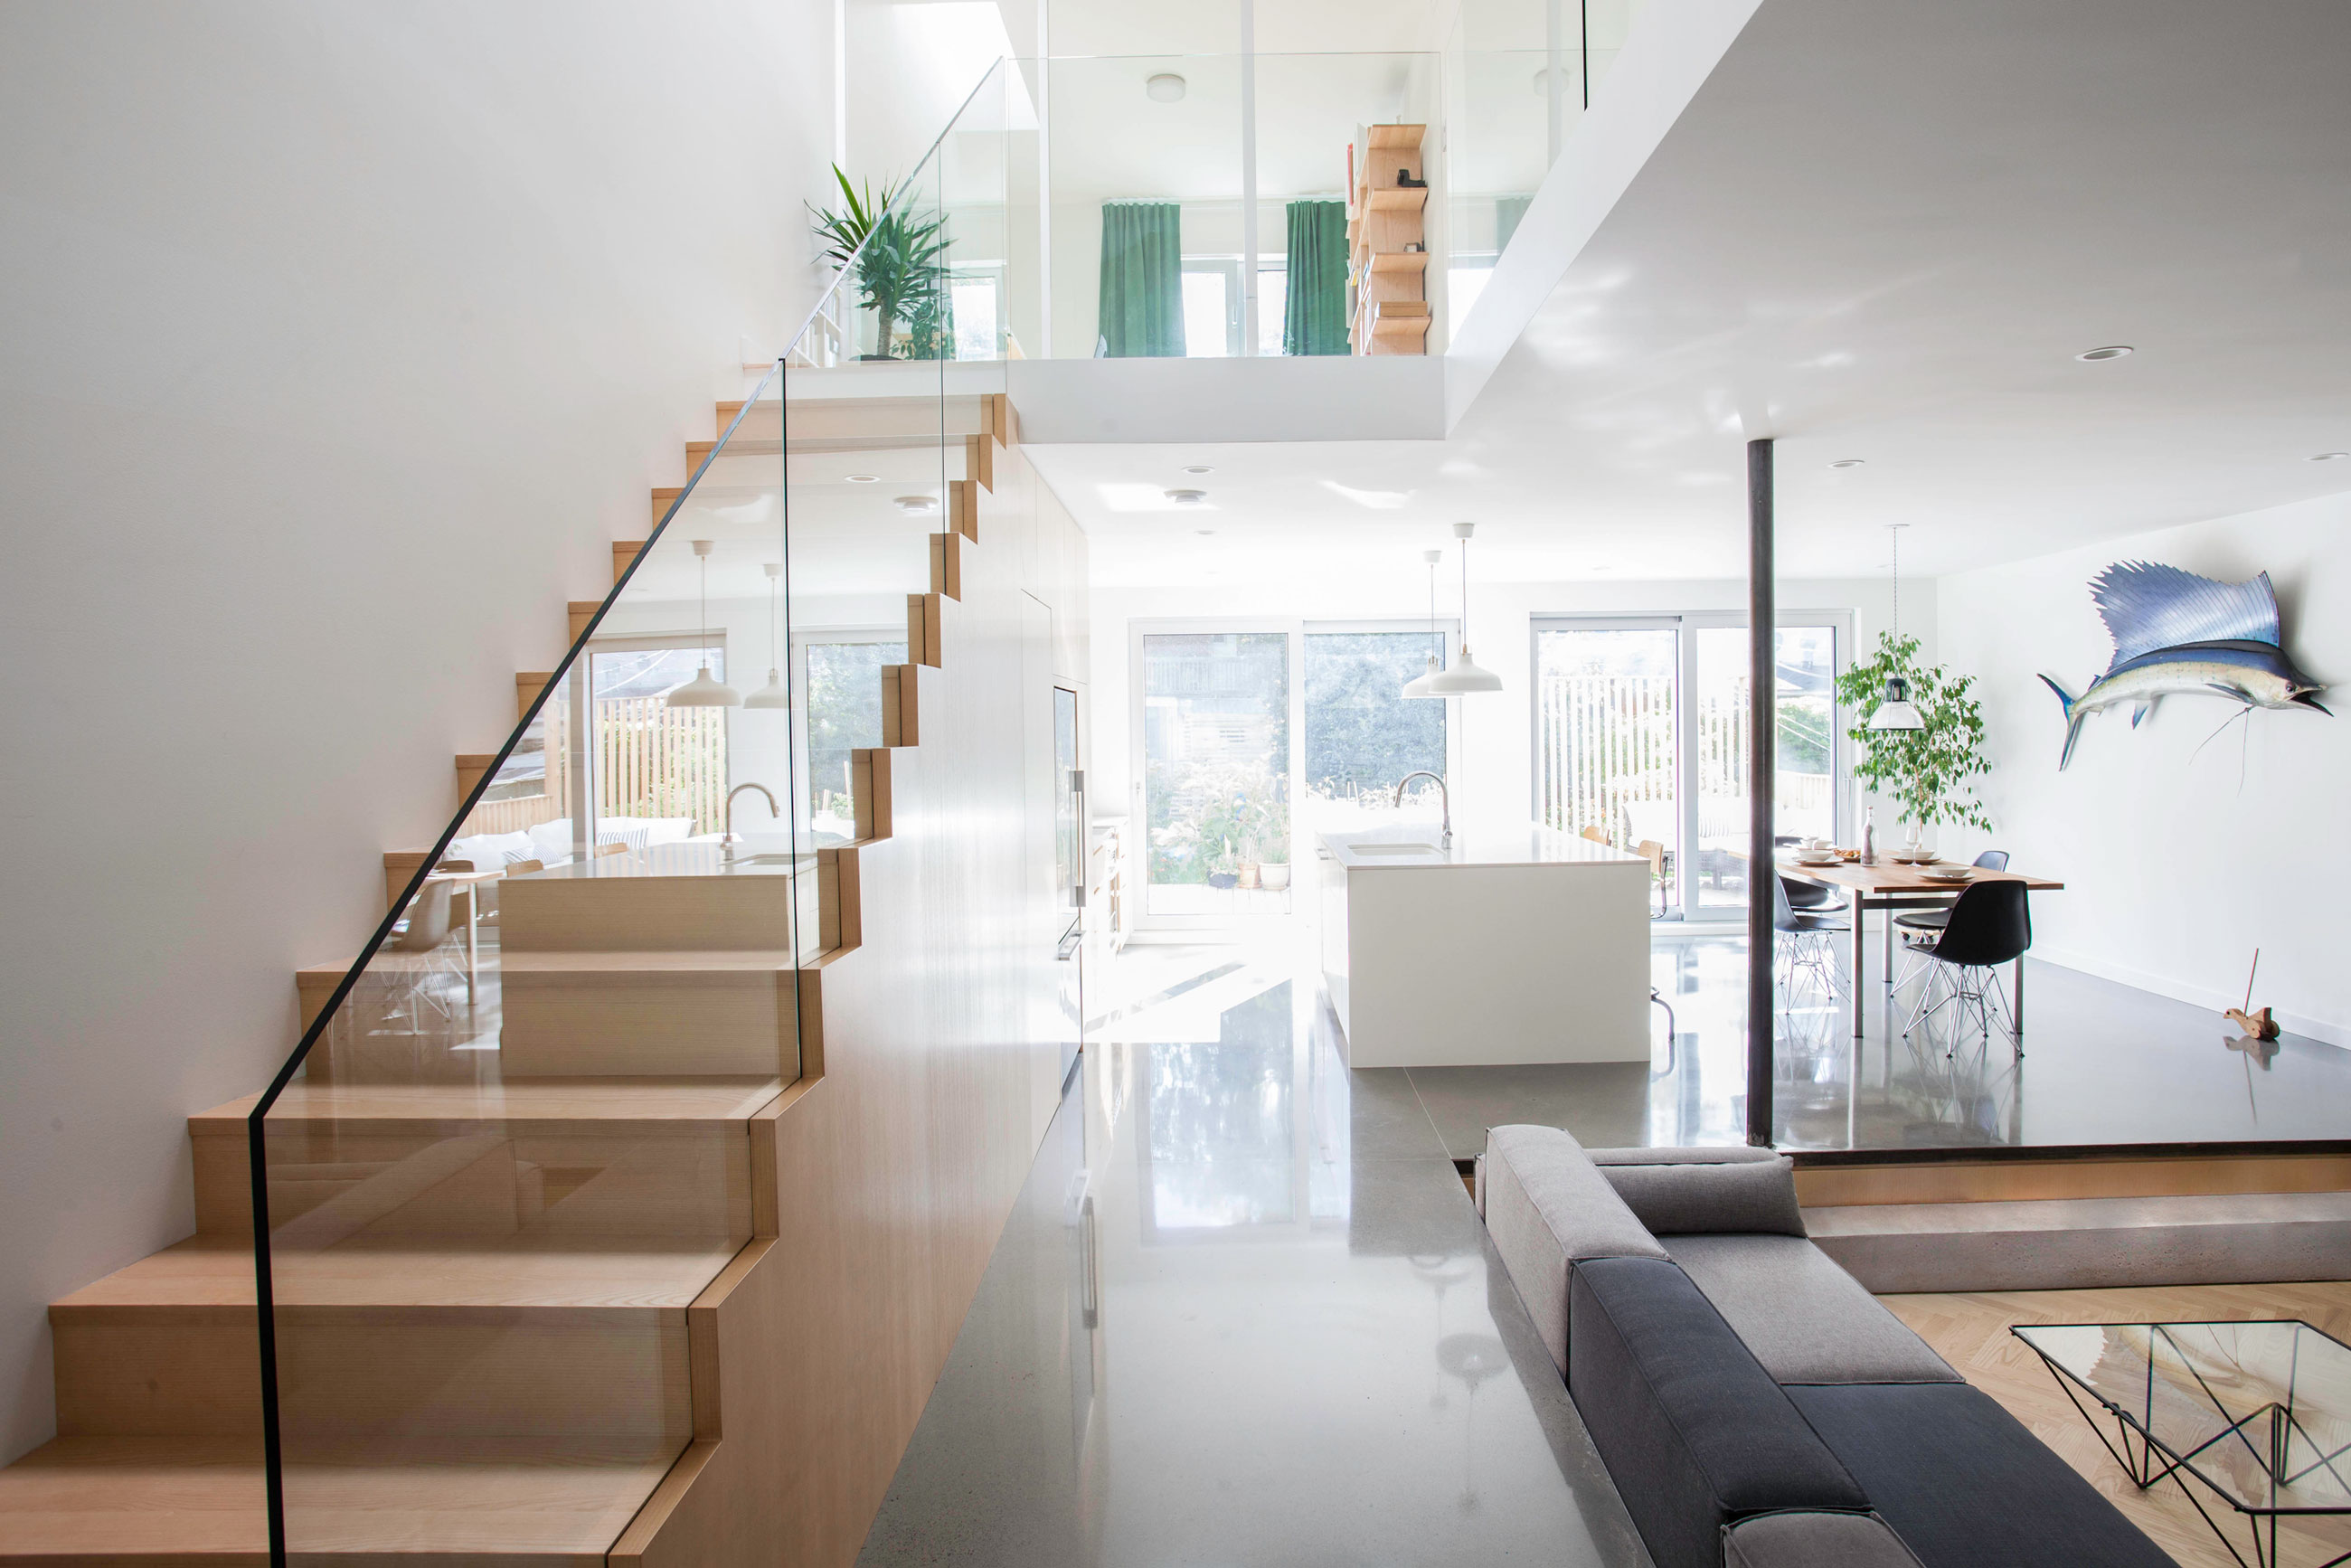 APPAREIL Architecture Completes a Home Renovation in Montréal